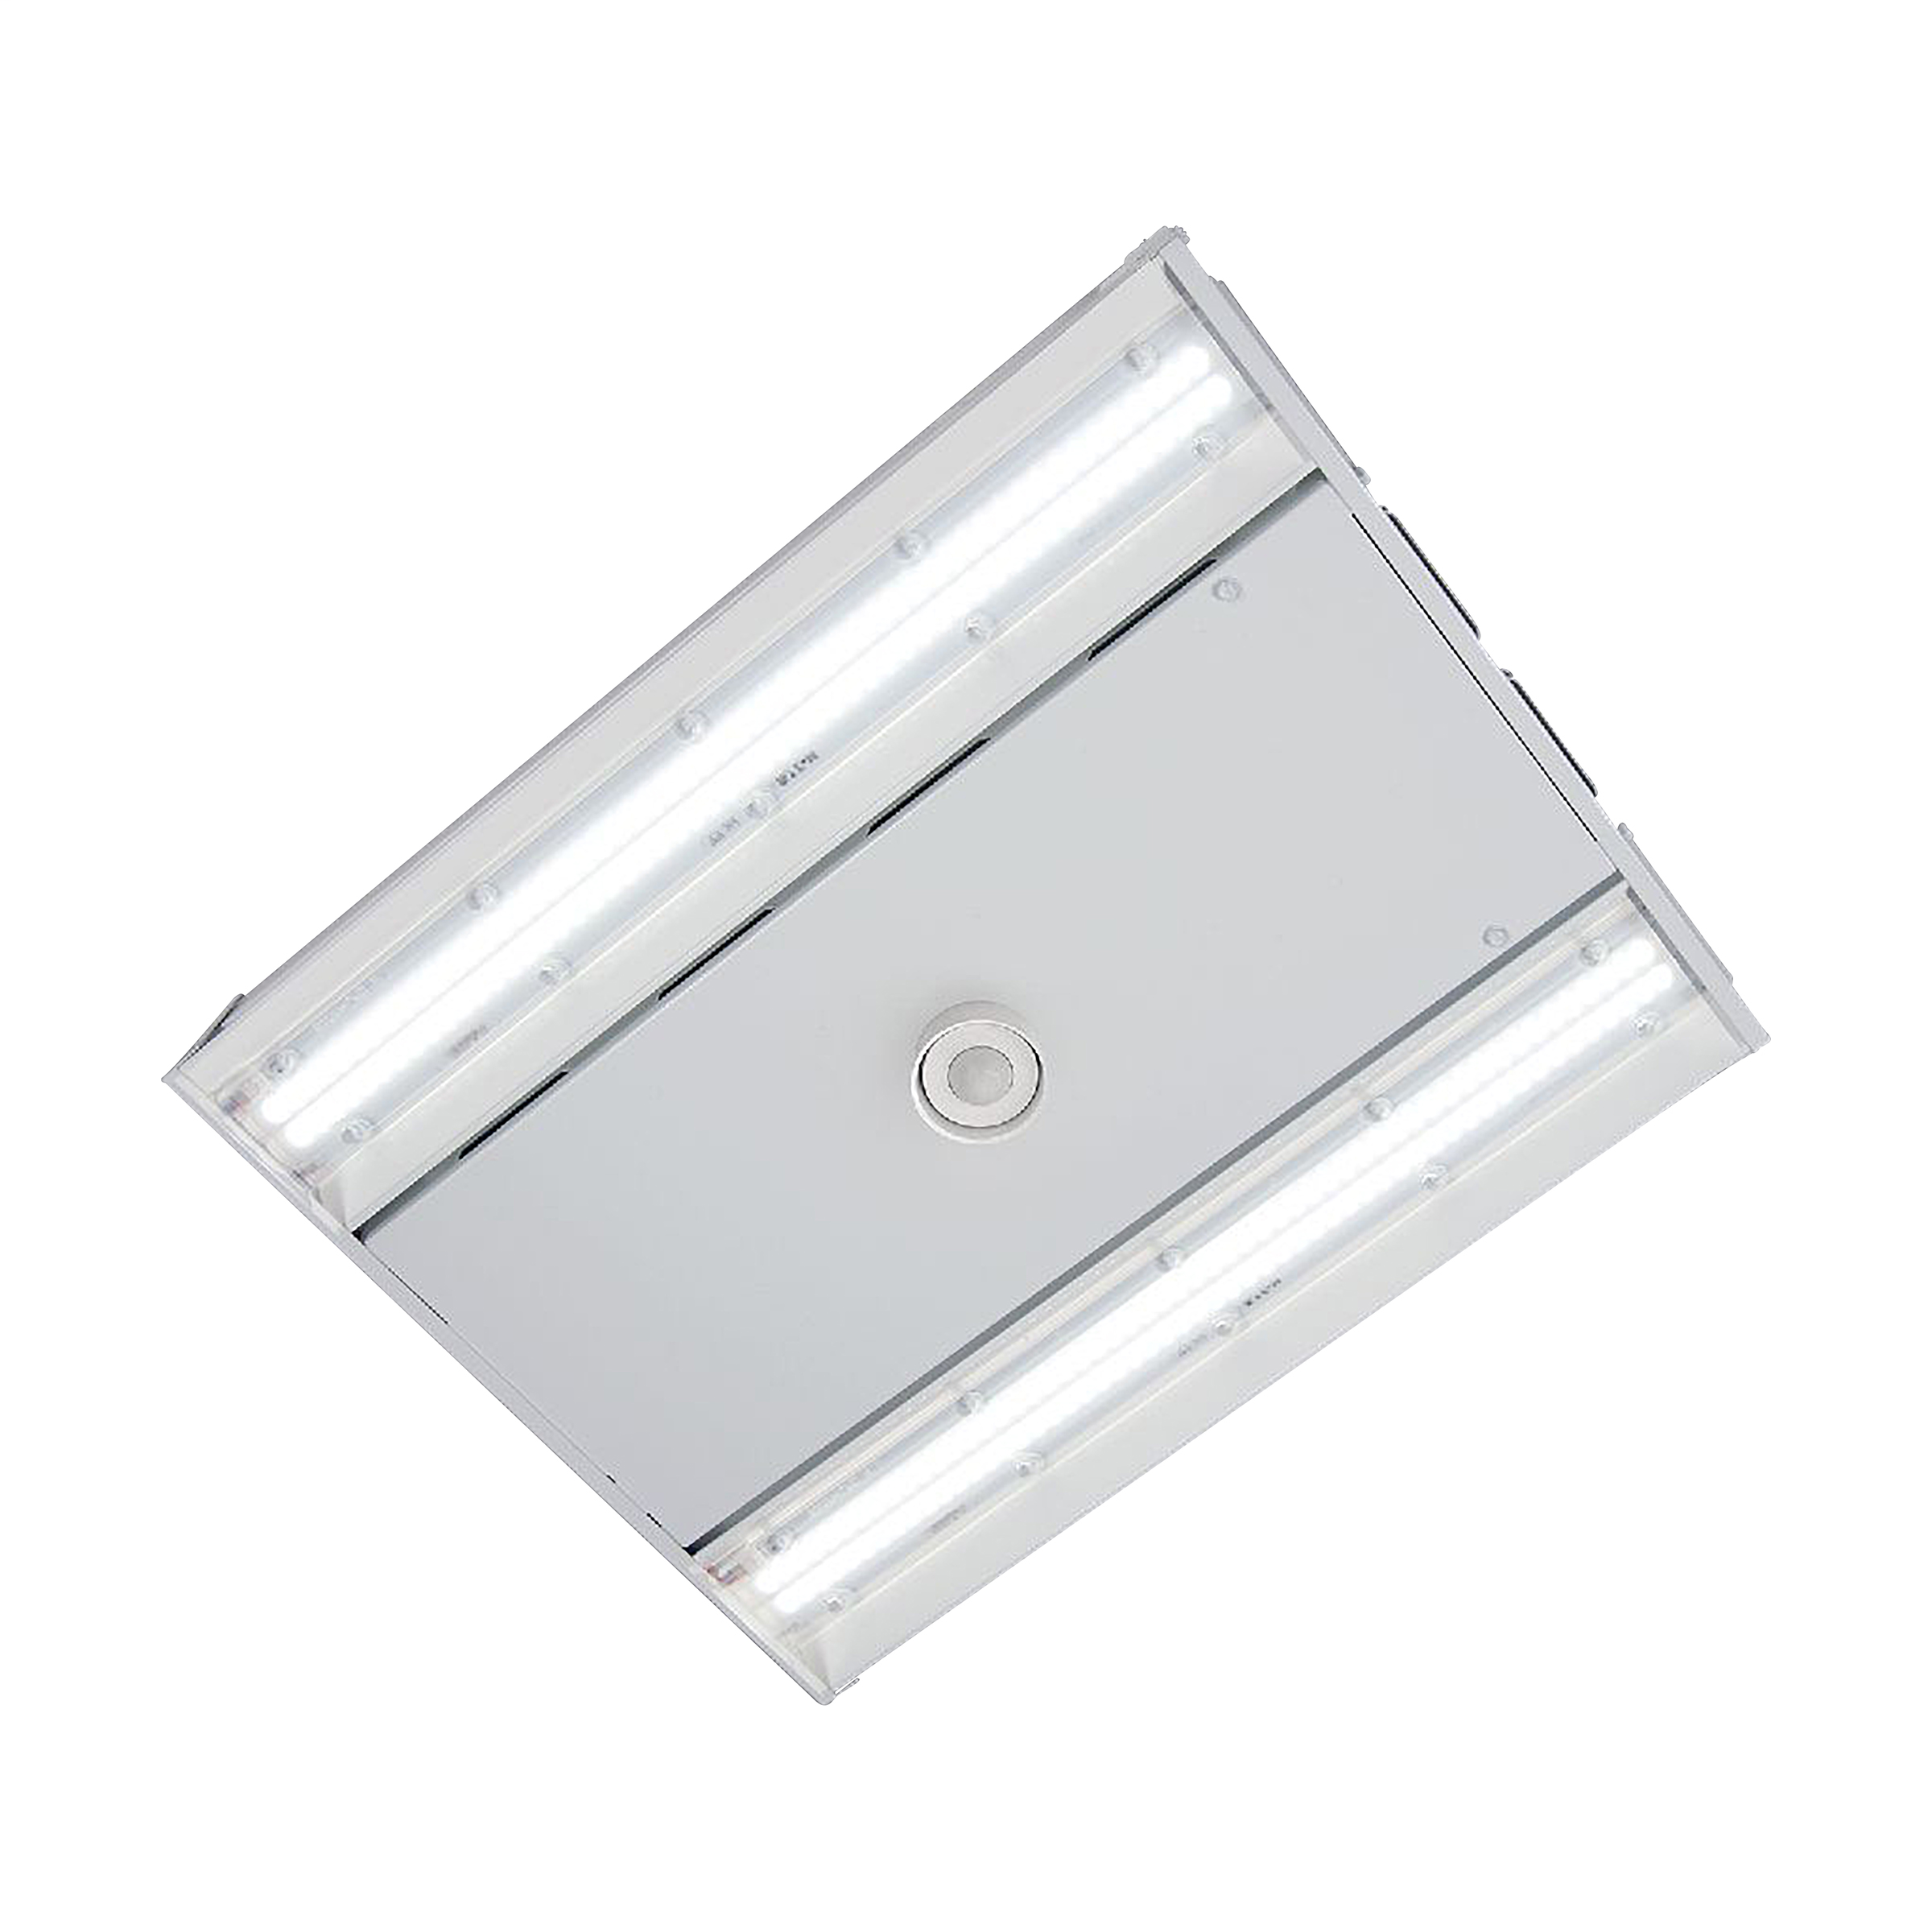 Metalux VHB LED High Bay